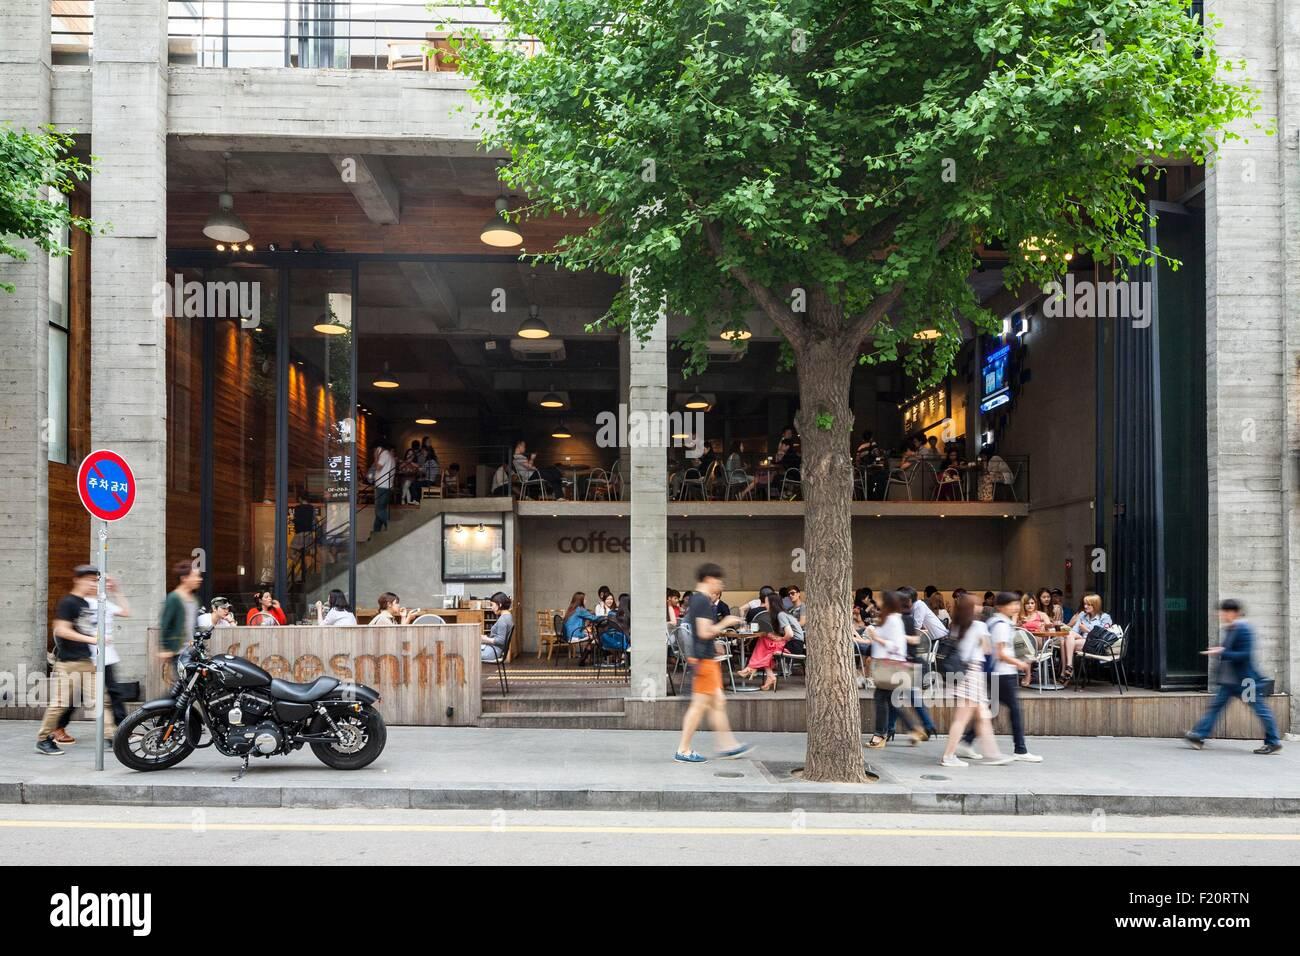 South Korea Seoul Gangnam District Sinsadong Garosugil Street